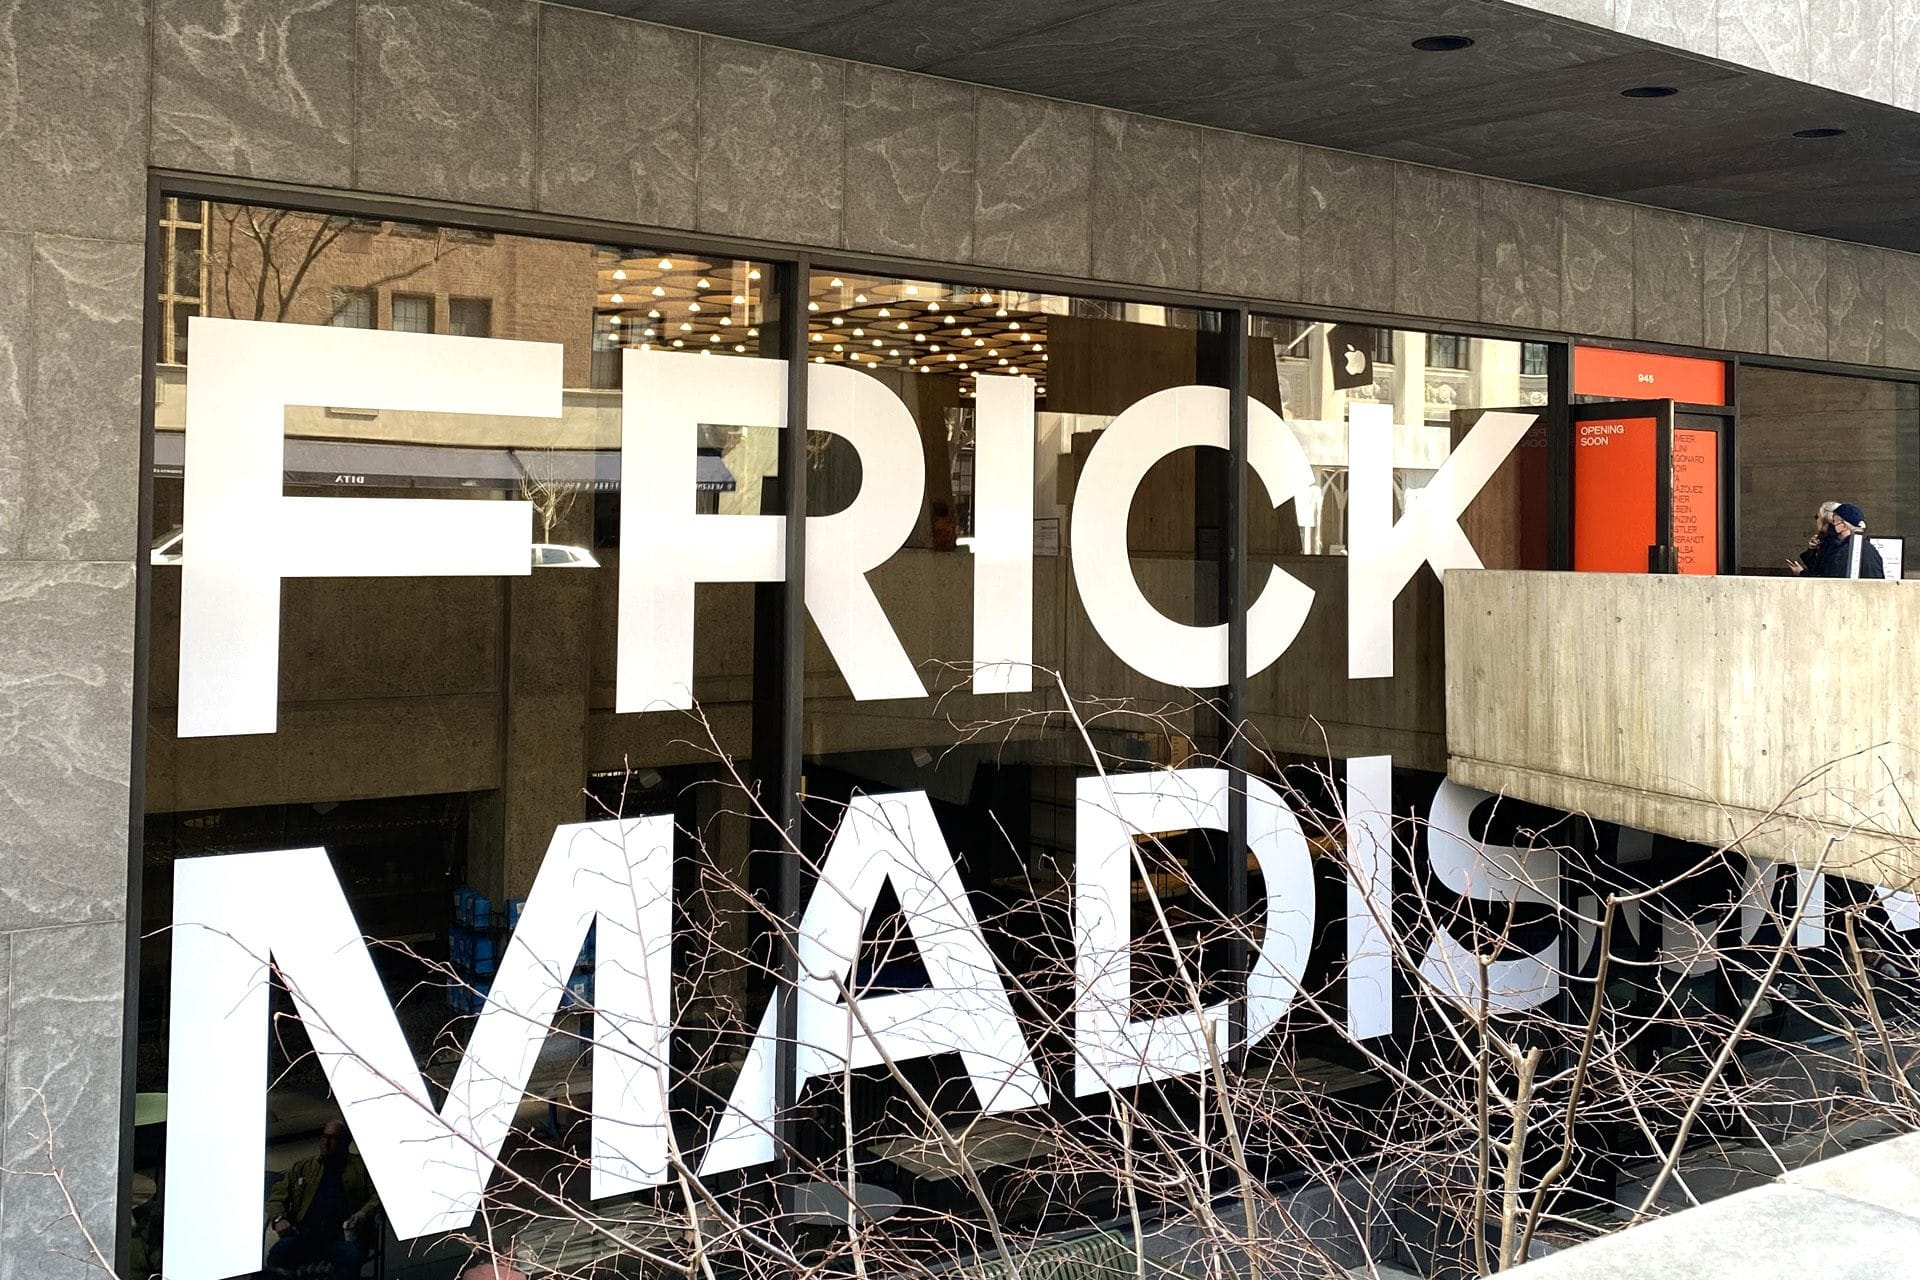 Frick Madison exterior